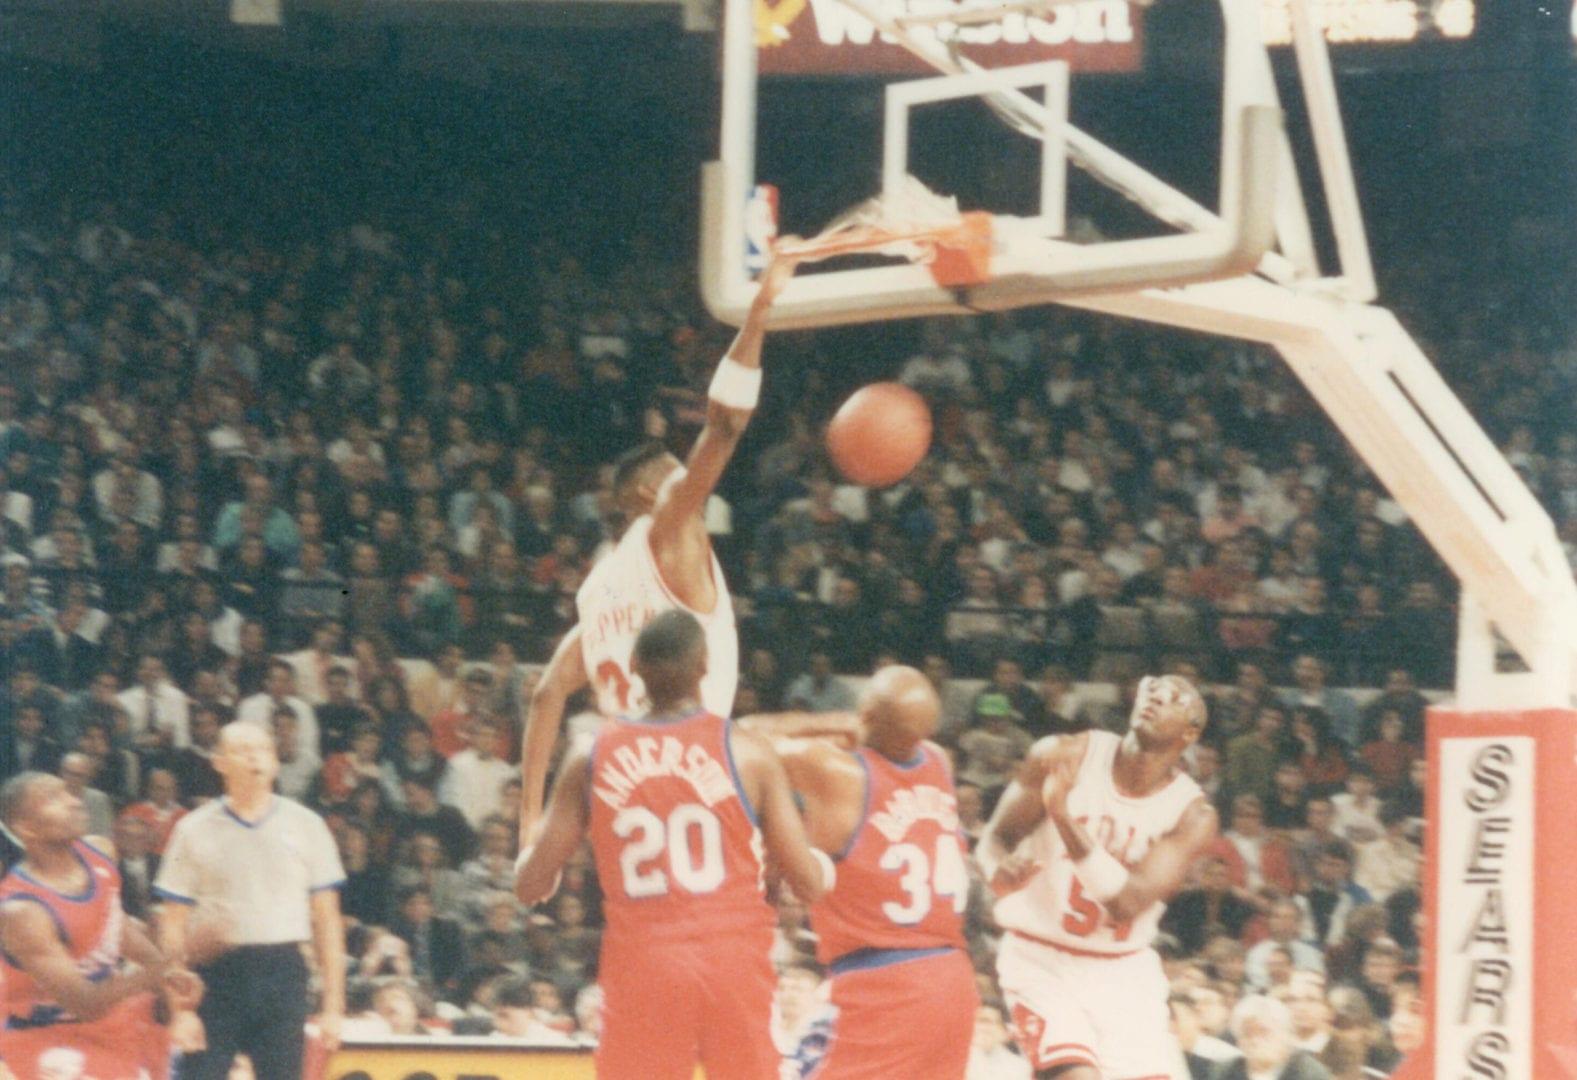 Scottie Pippen dunking